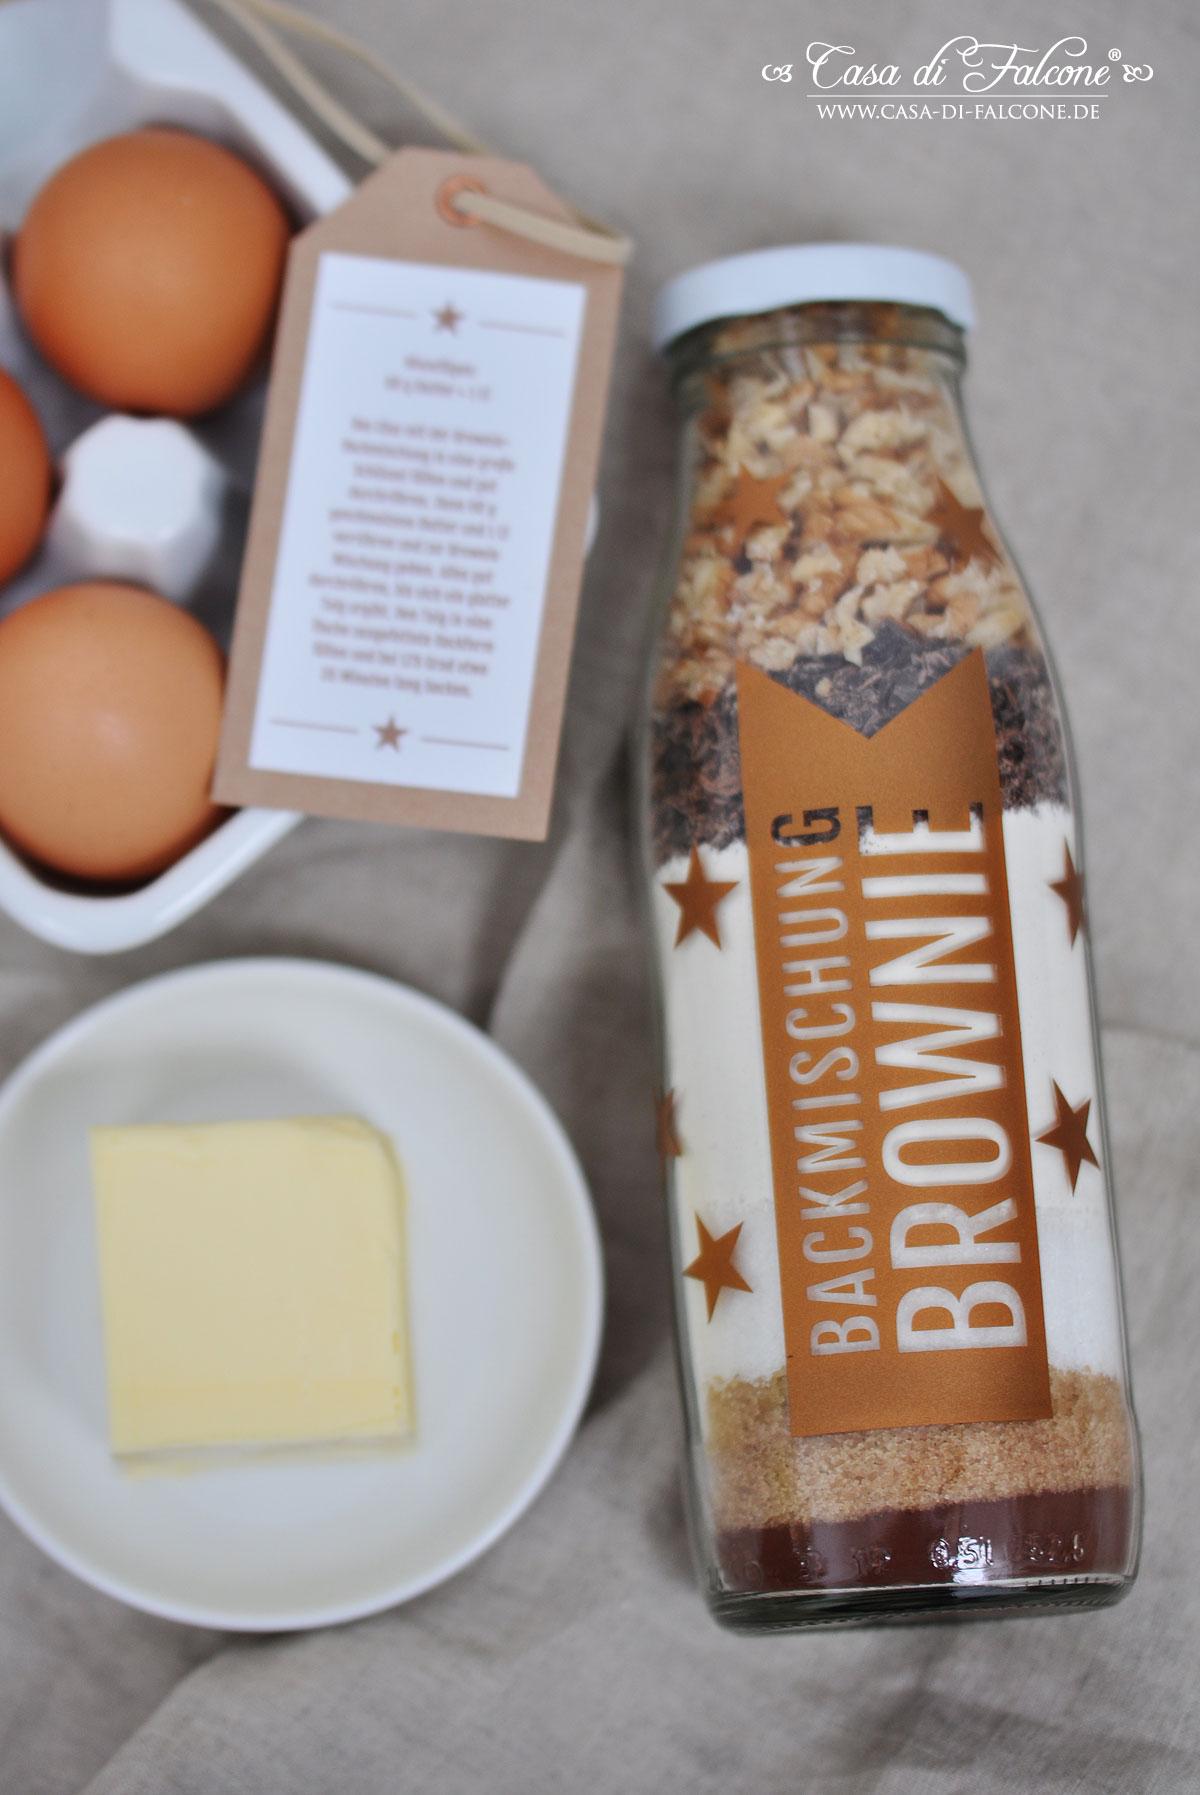 Backmischung Brownies Verpackungsidee Casa Di Falcone